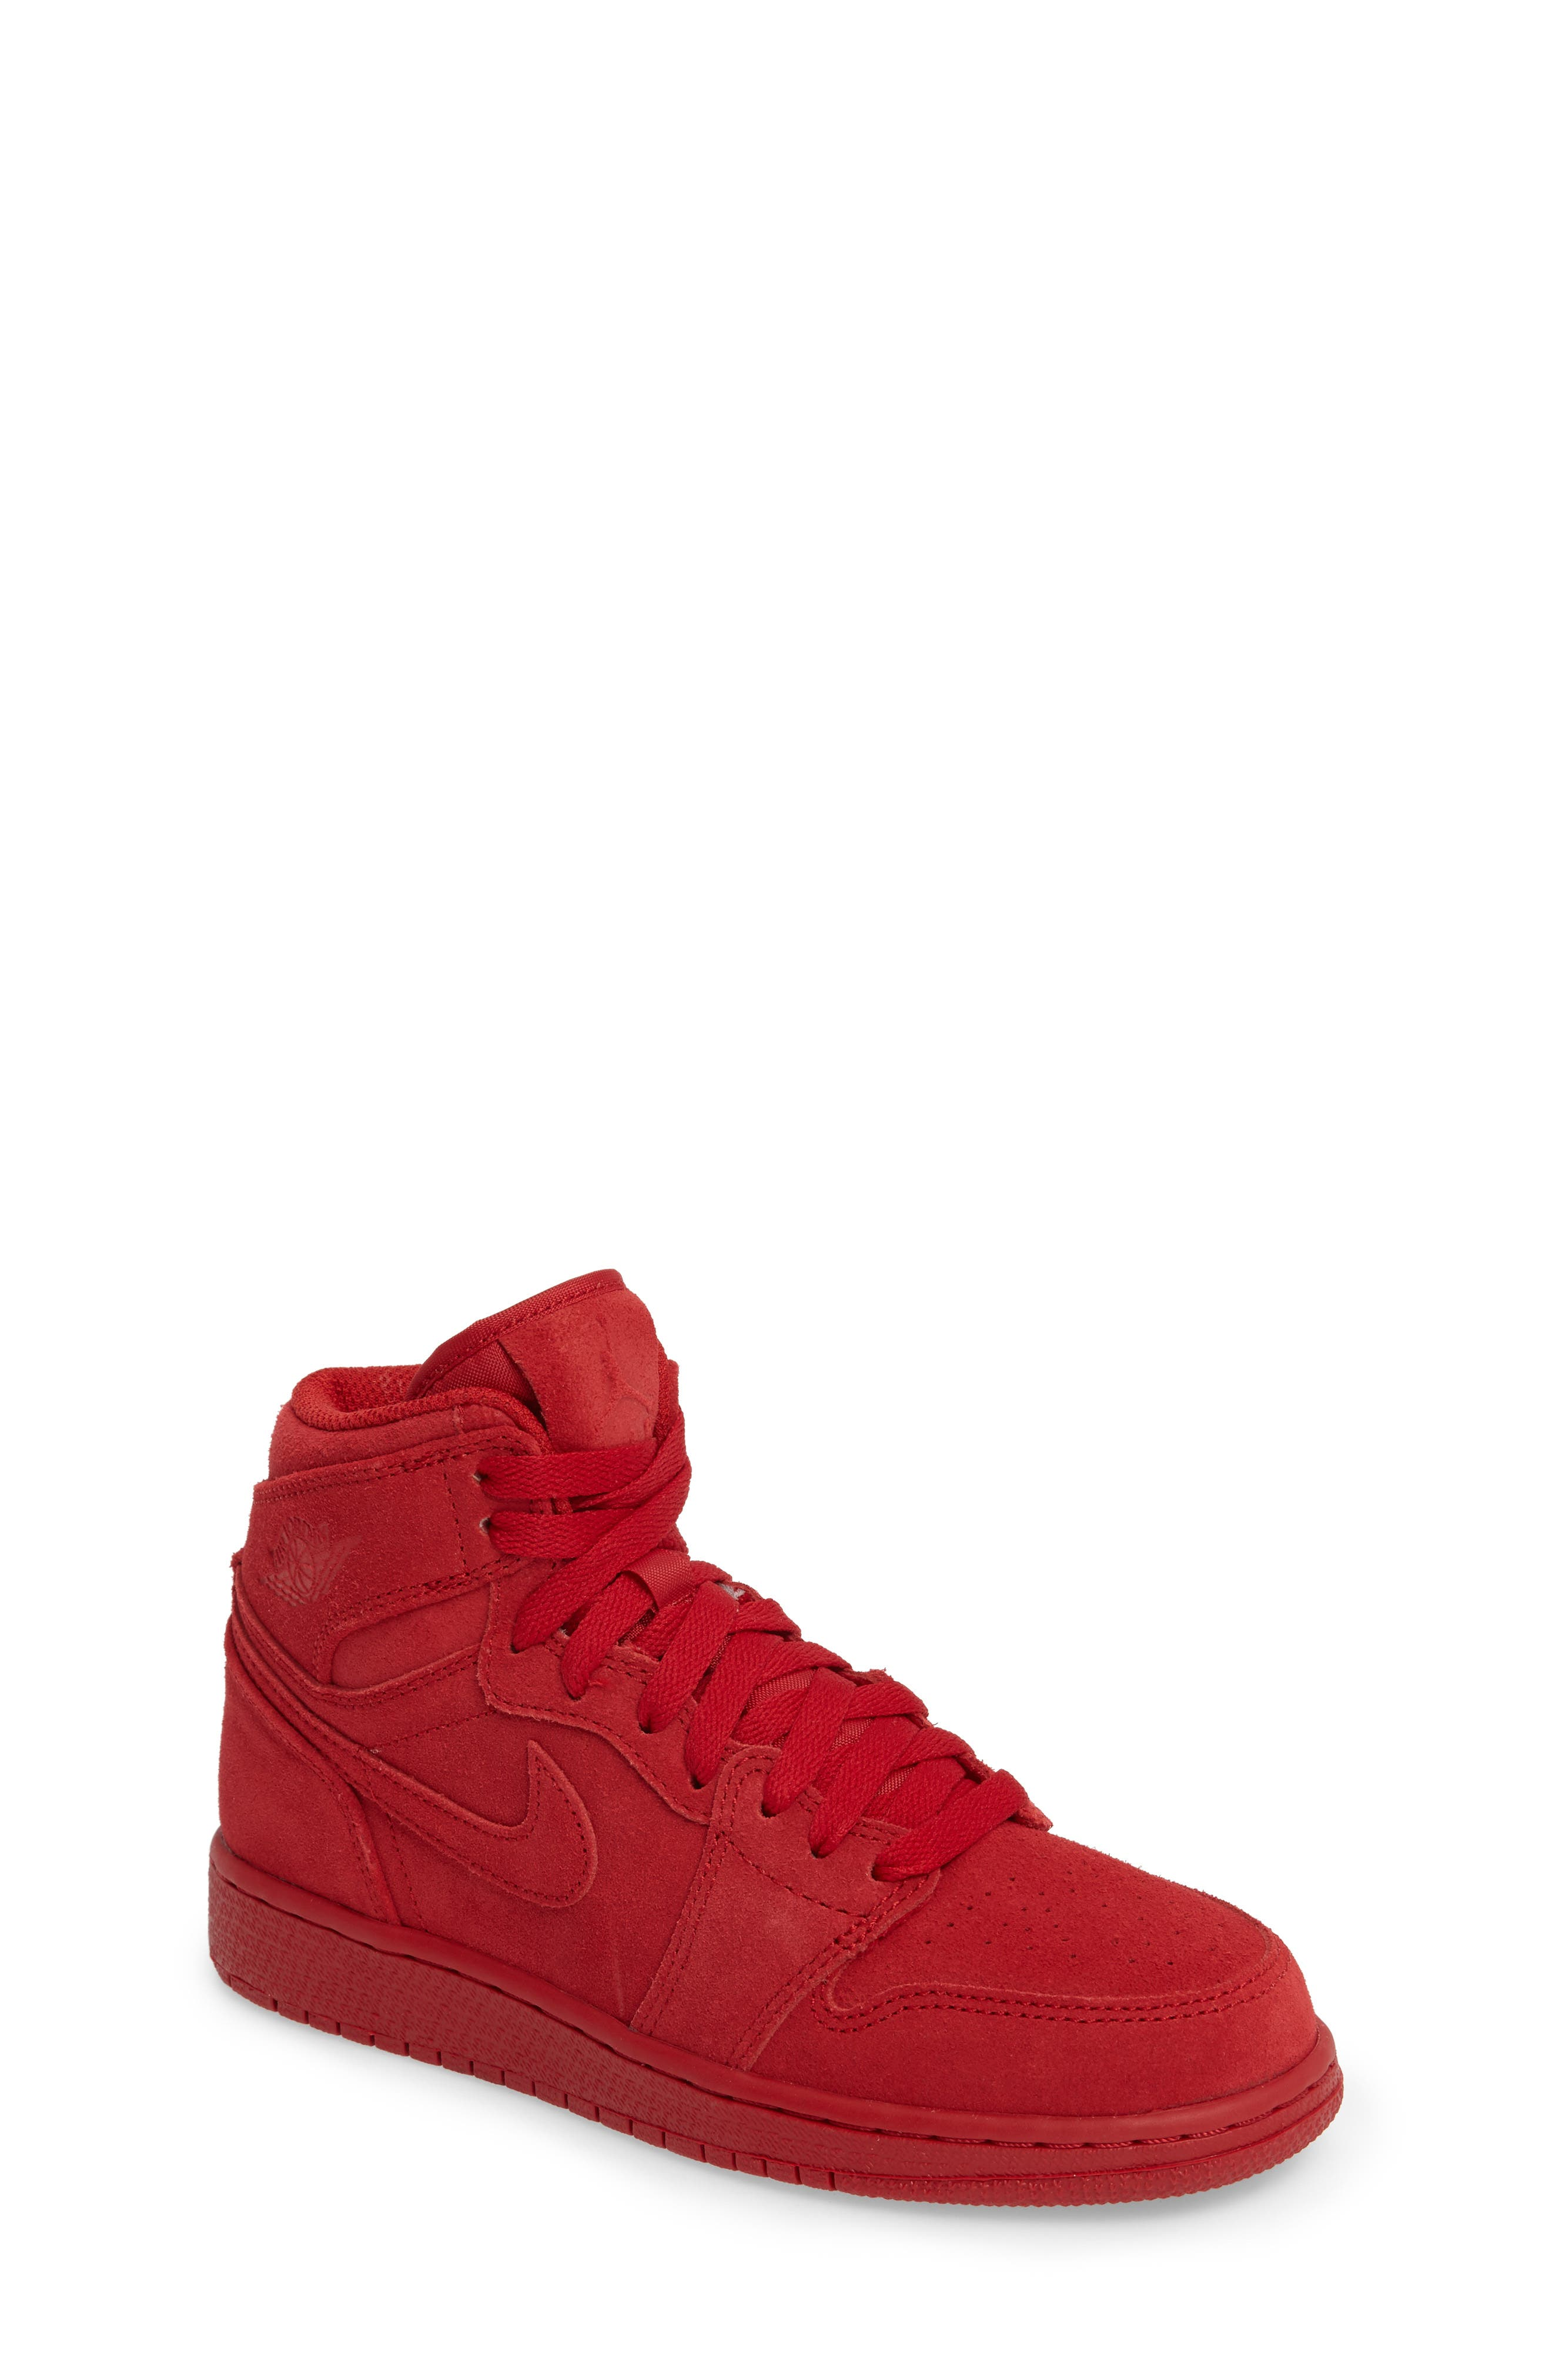 NIKE 'Jordan 1 Retro High' Sneaker